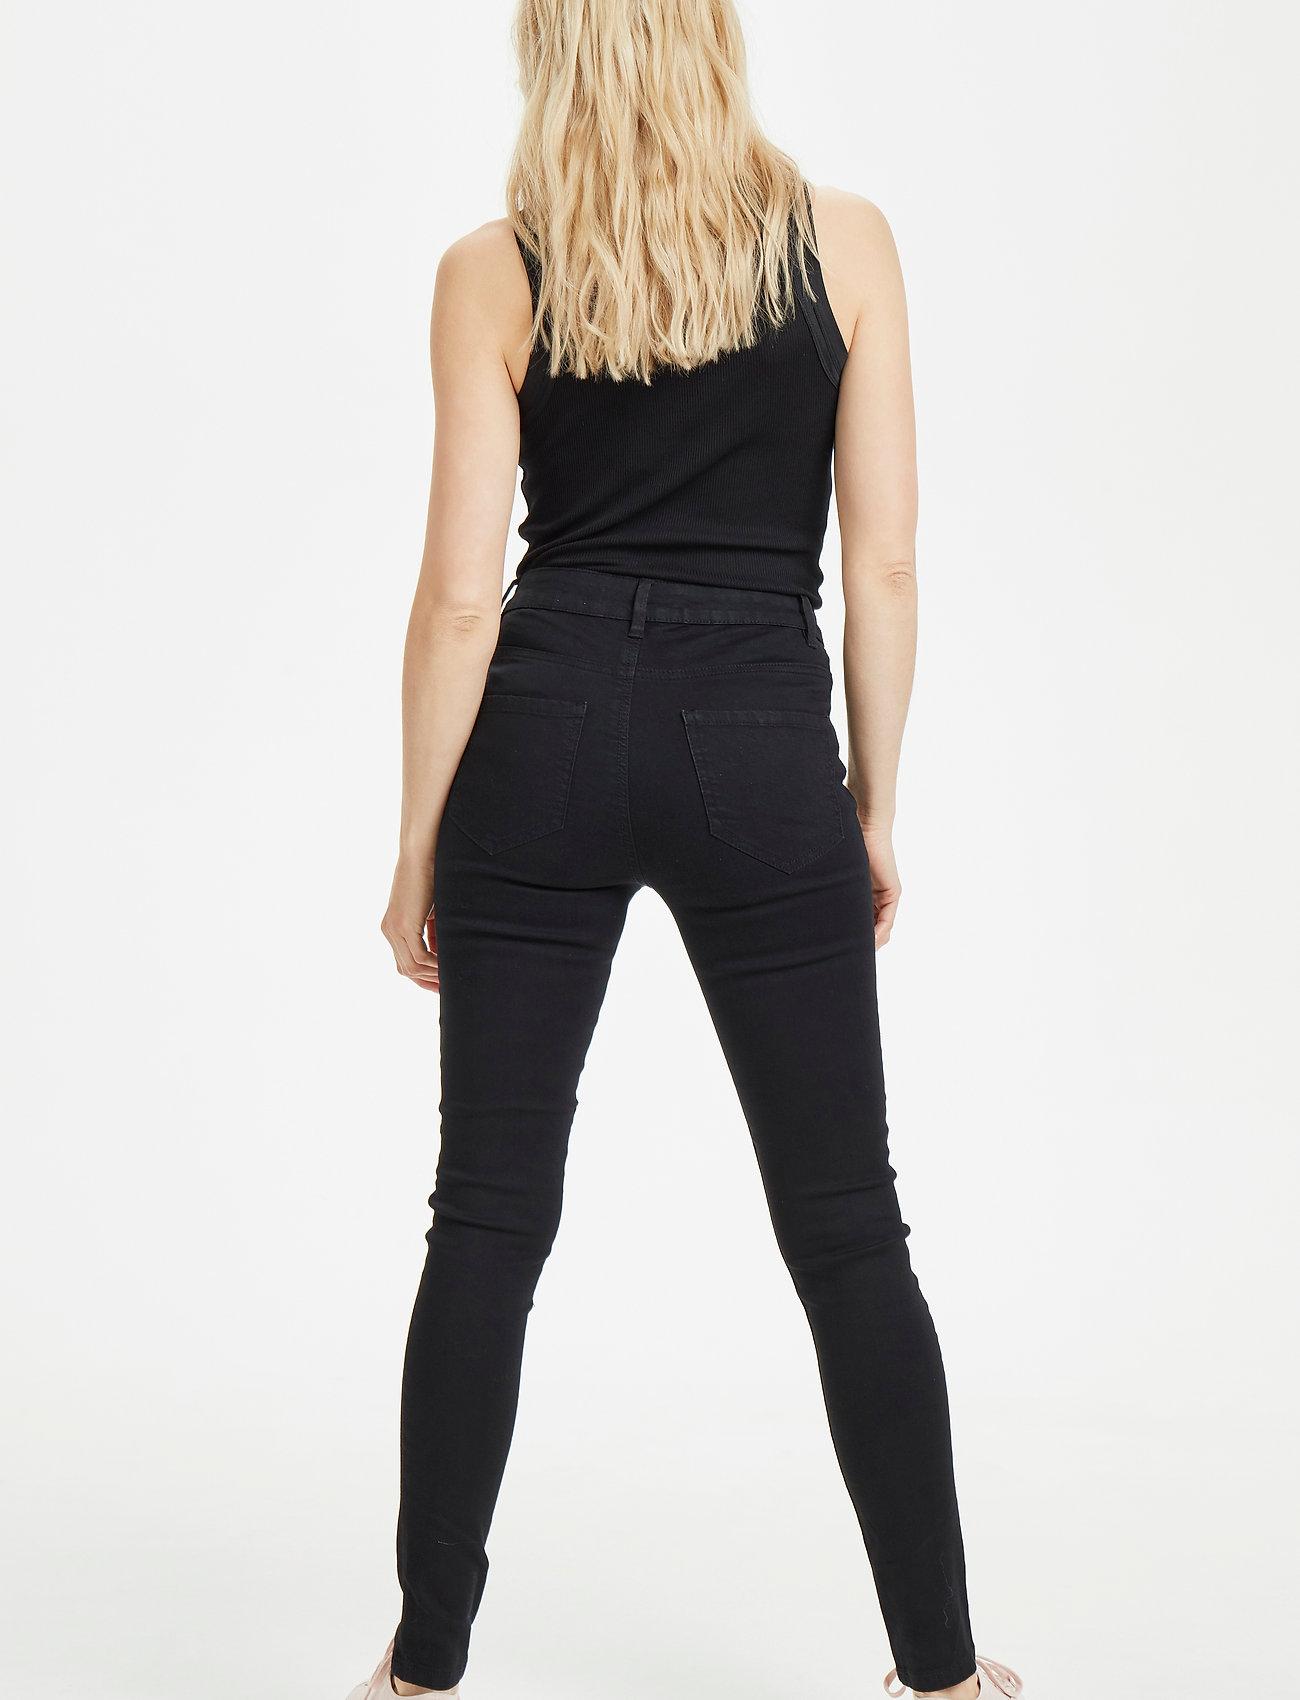 Saint Tropez - T5757, UllaSZ Jeans - skinny jeans - black - 4